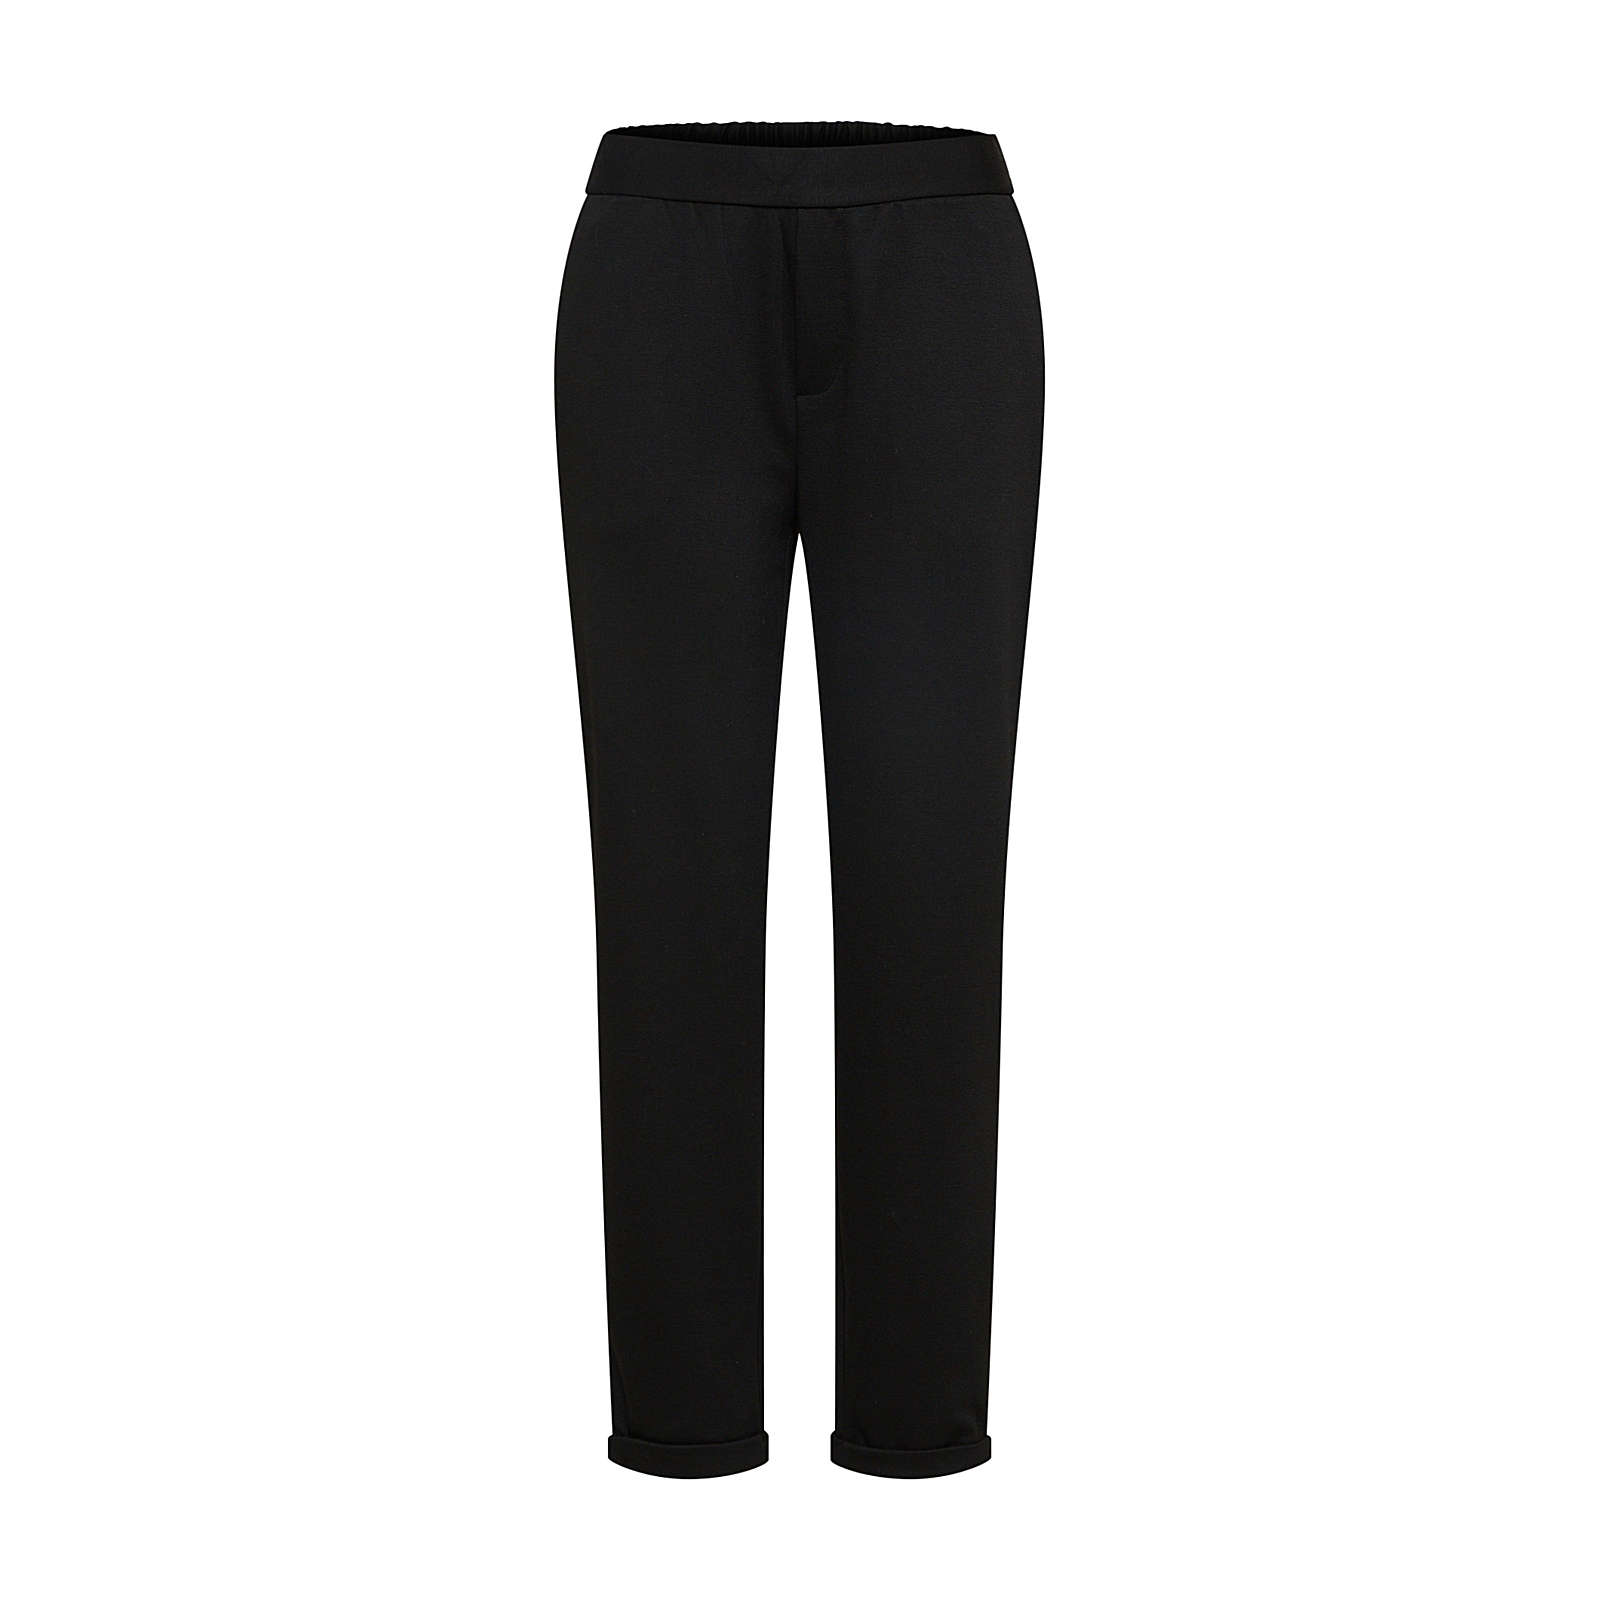 OBJECT Bundfaltenhose Stoffhosen schwarz Damen Gr. 34